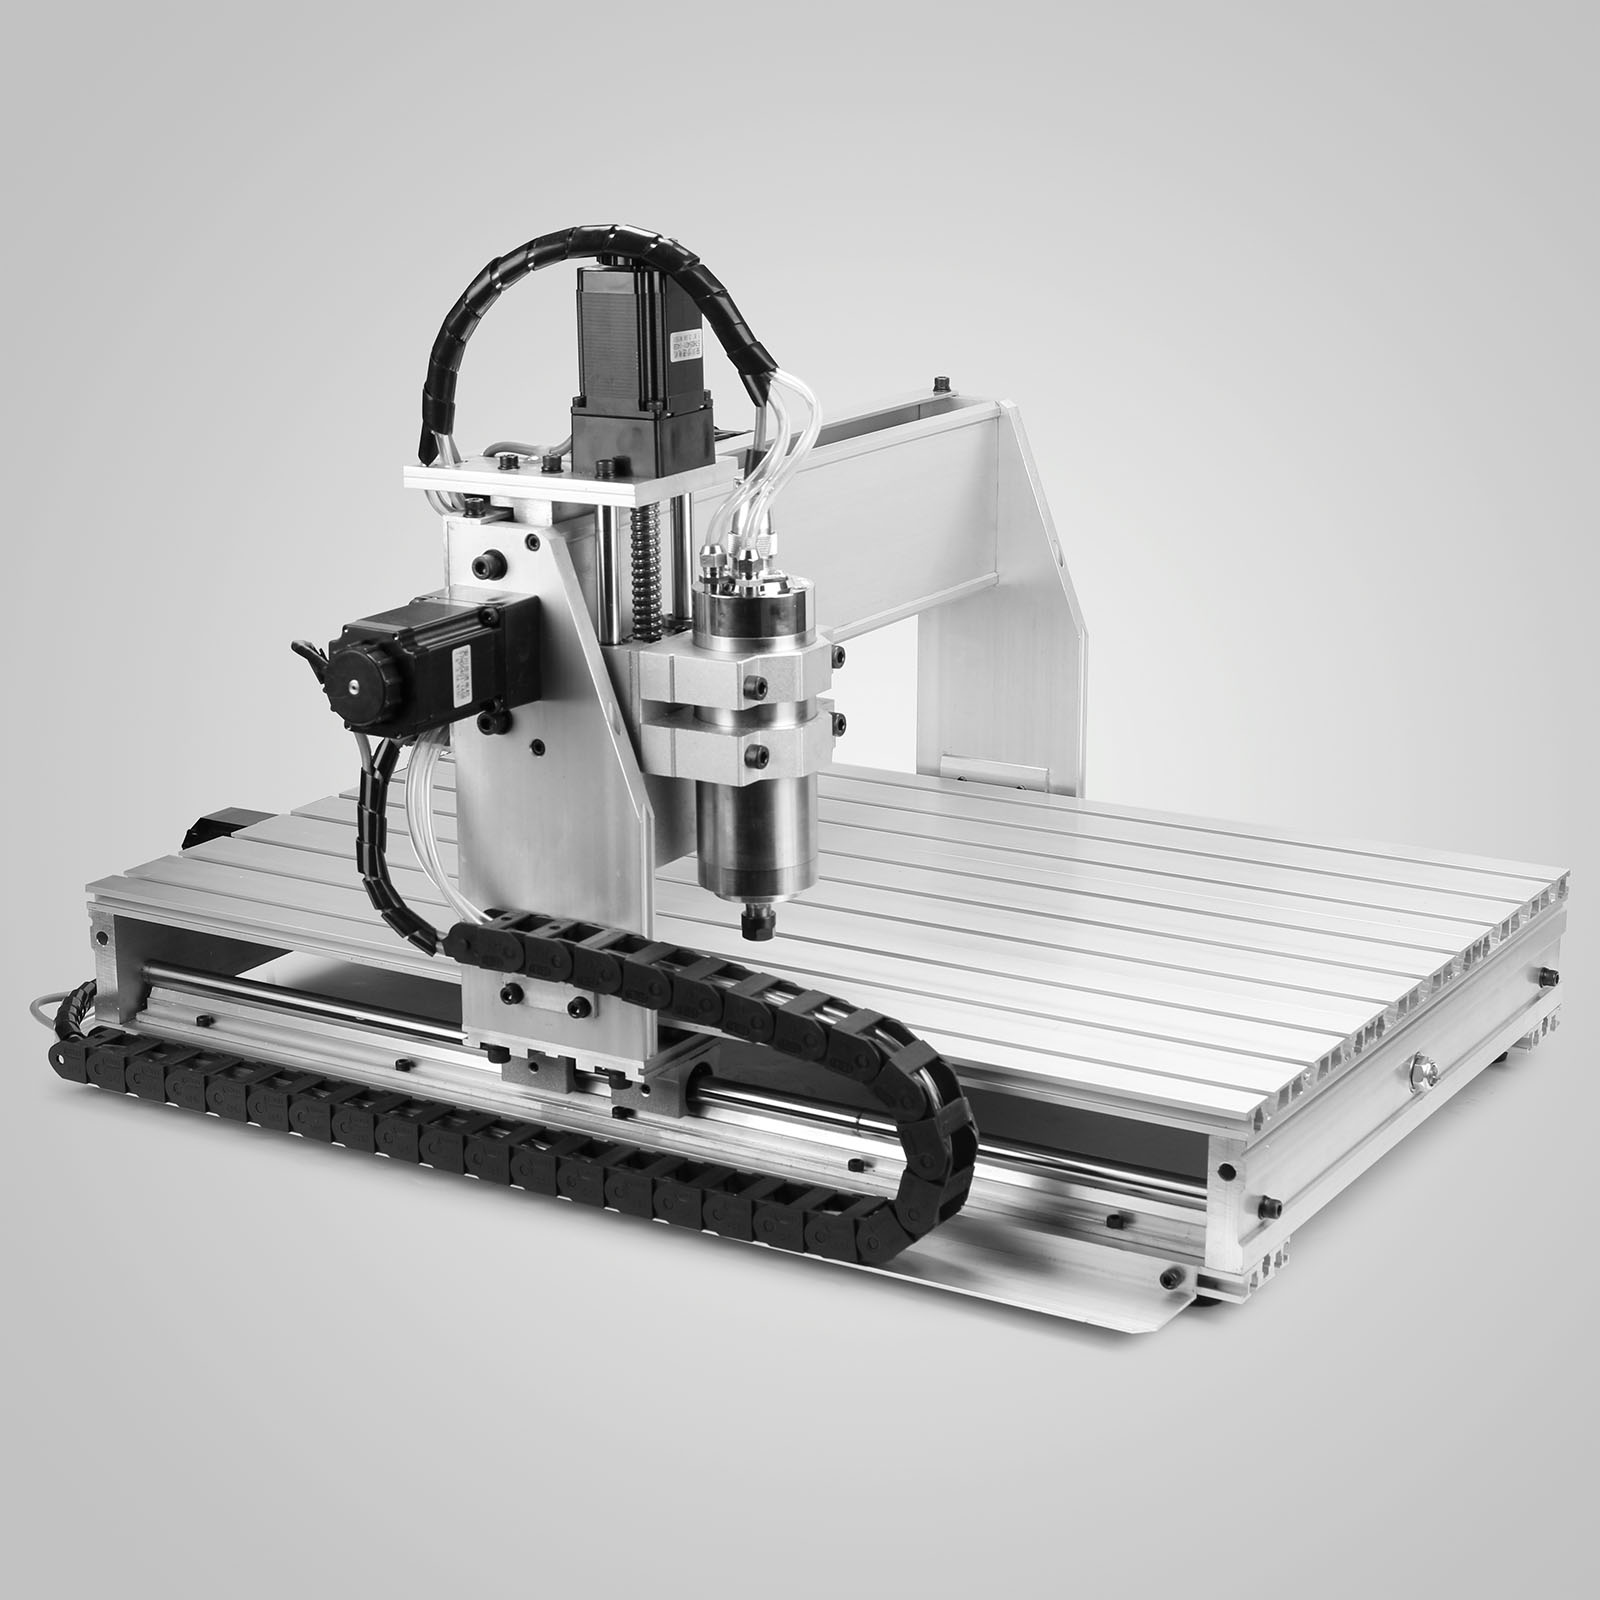 Benchtop Cnc Router Kit Pro6060 5 X 5 Cnc Router Kit